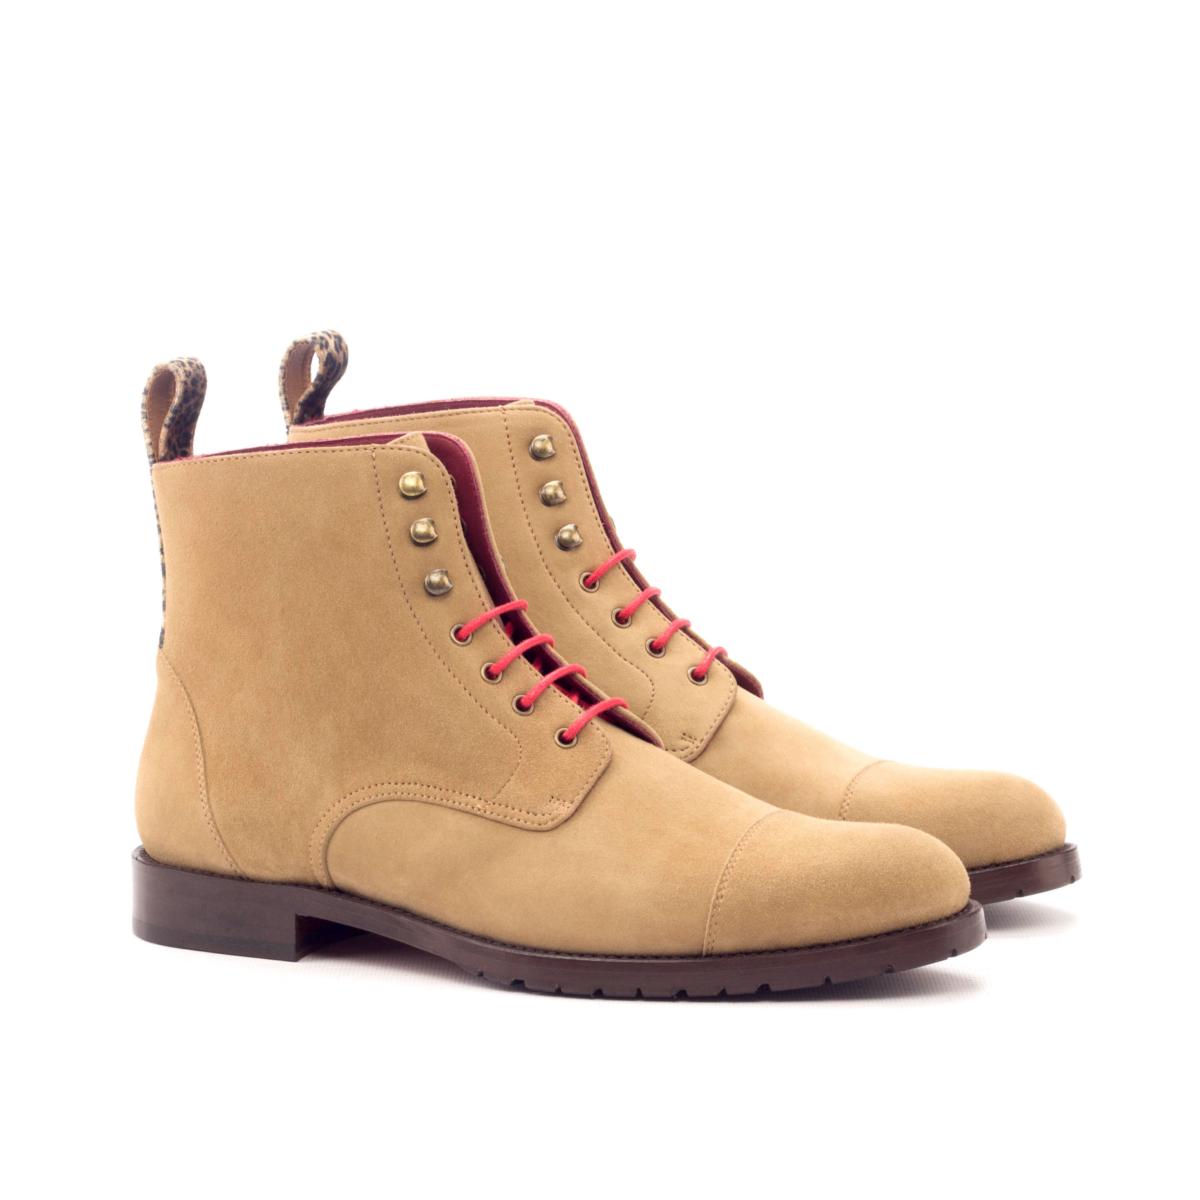 Women Lace Up Captoe Boot - Kid Suede Camel-Leopard Velvet